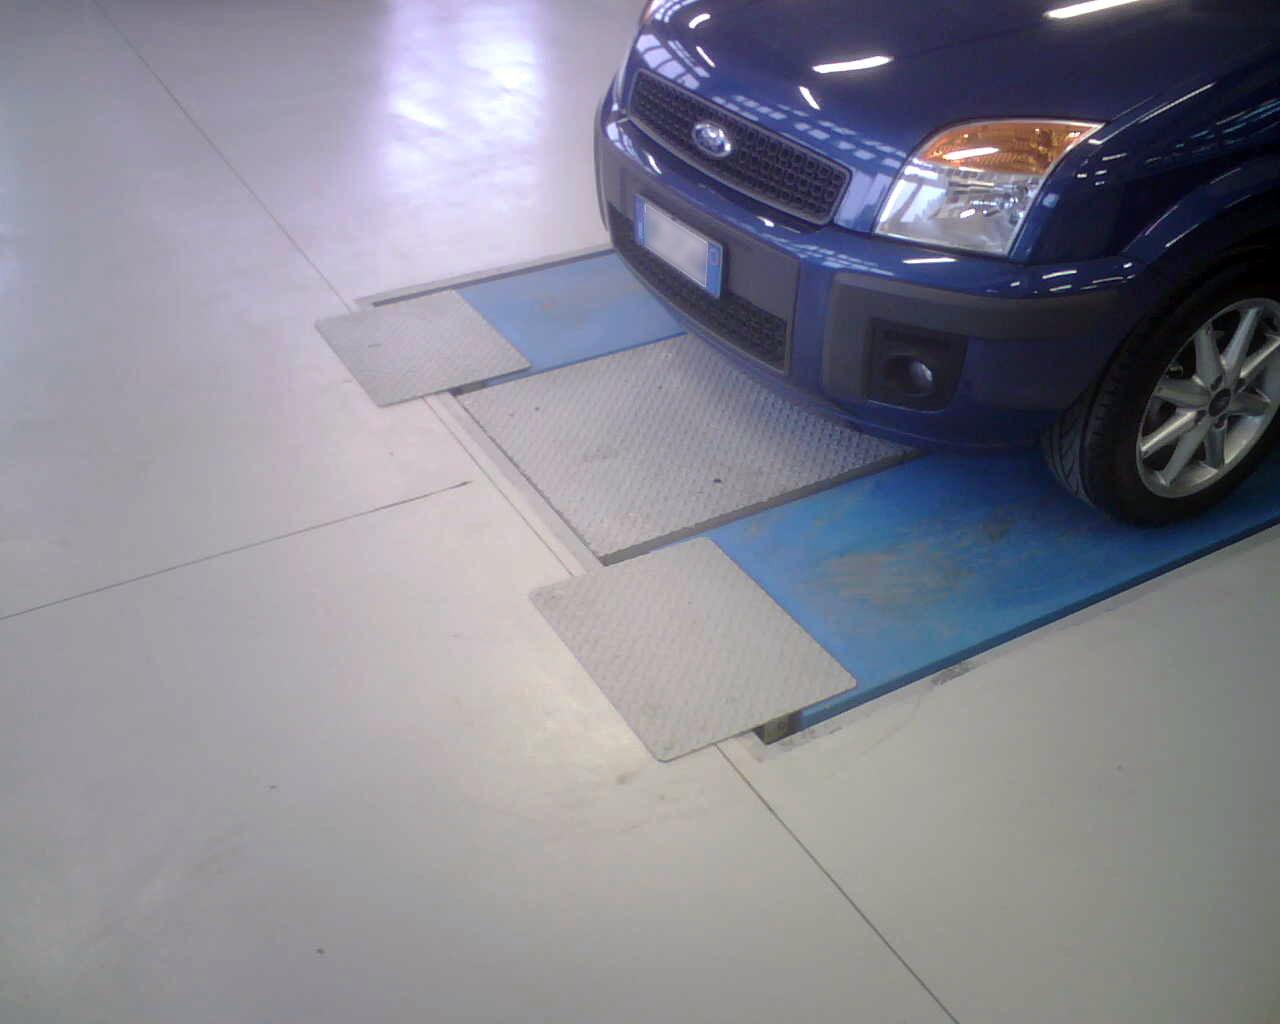 Pavimentazione officina meccanica guida materiali edili